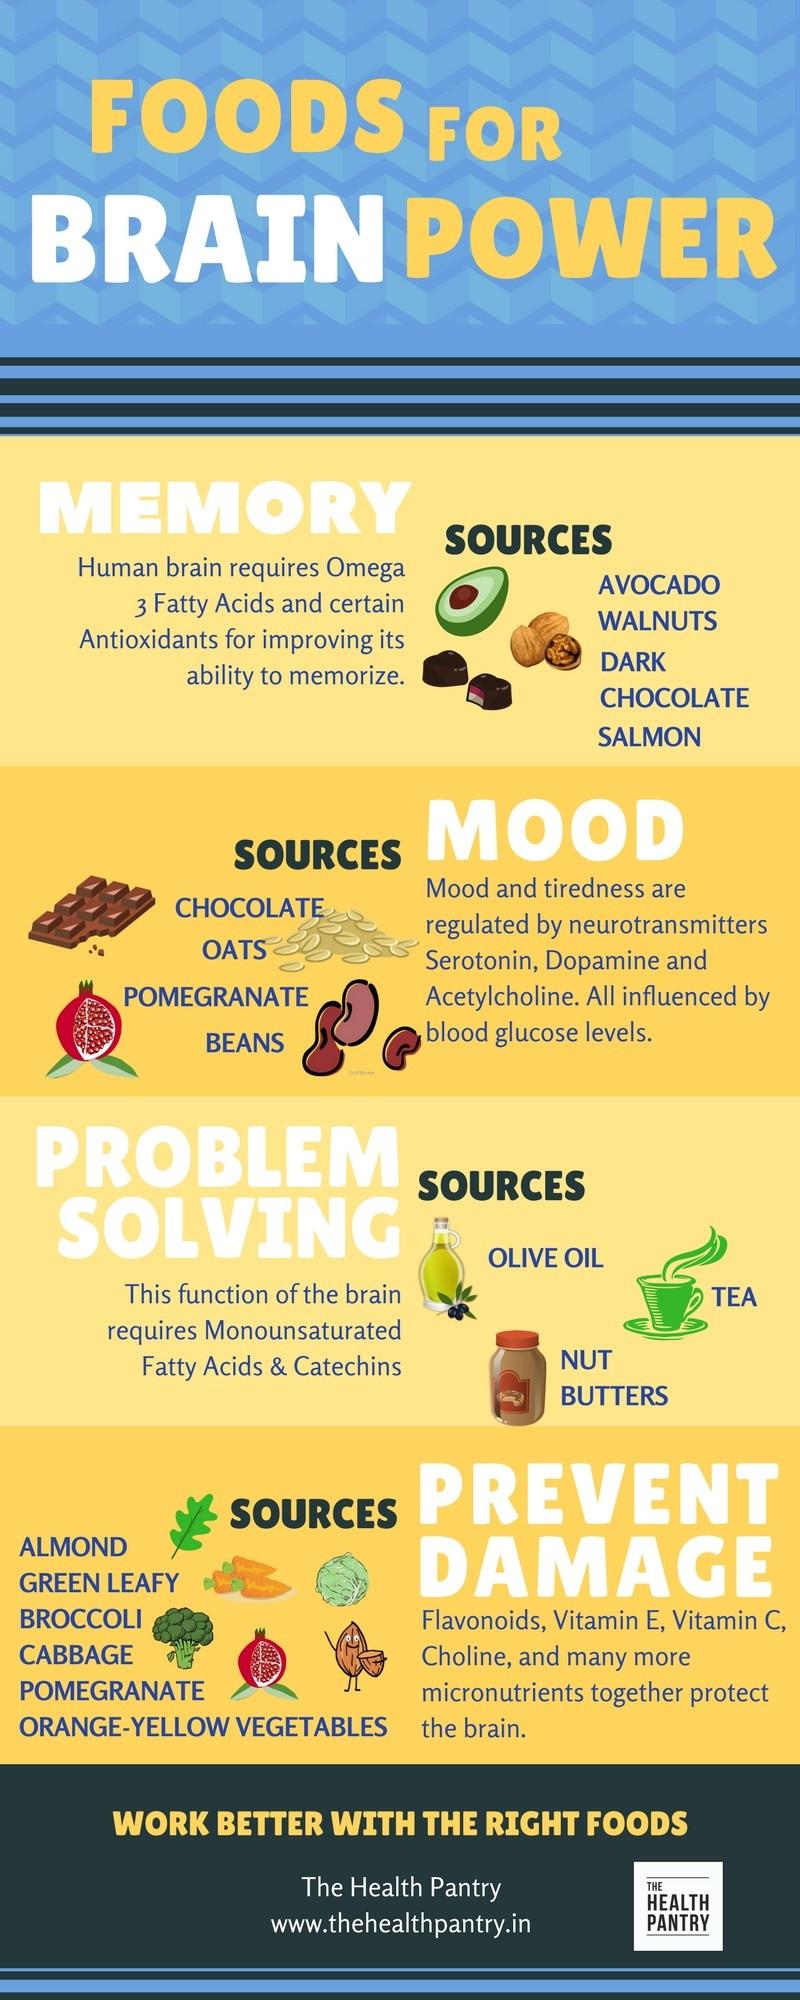 Foods for Brain Power - Khushboo Jain Tibrewala - Mumbai - The Health Pantry